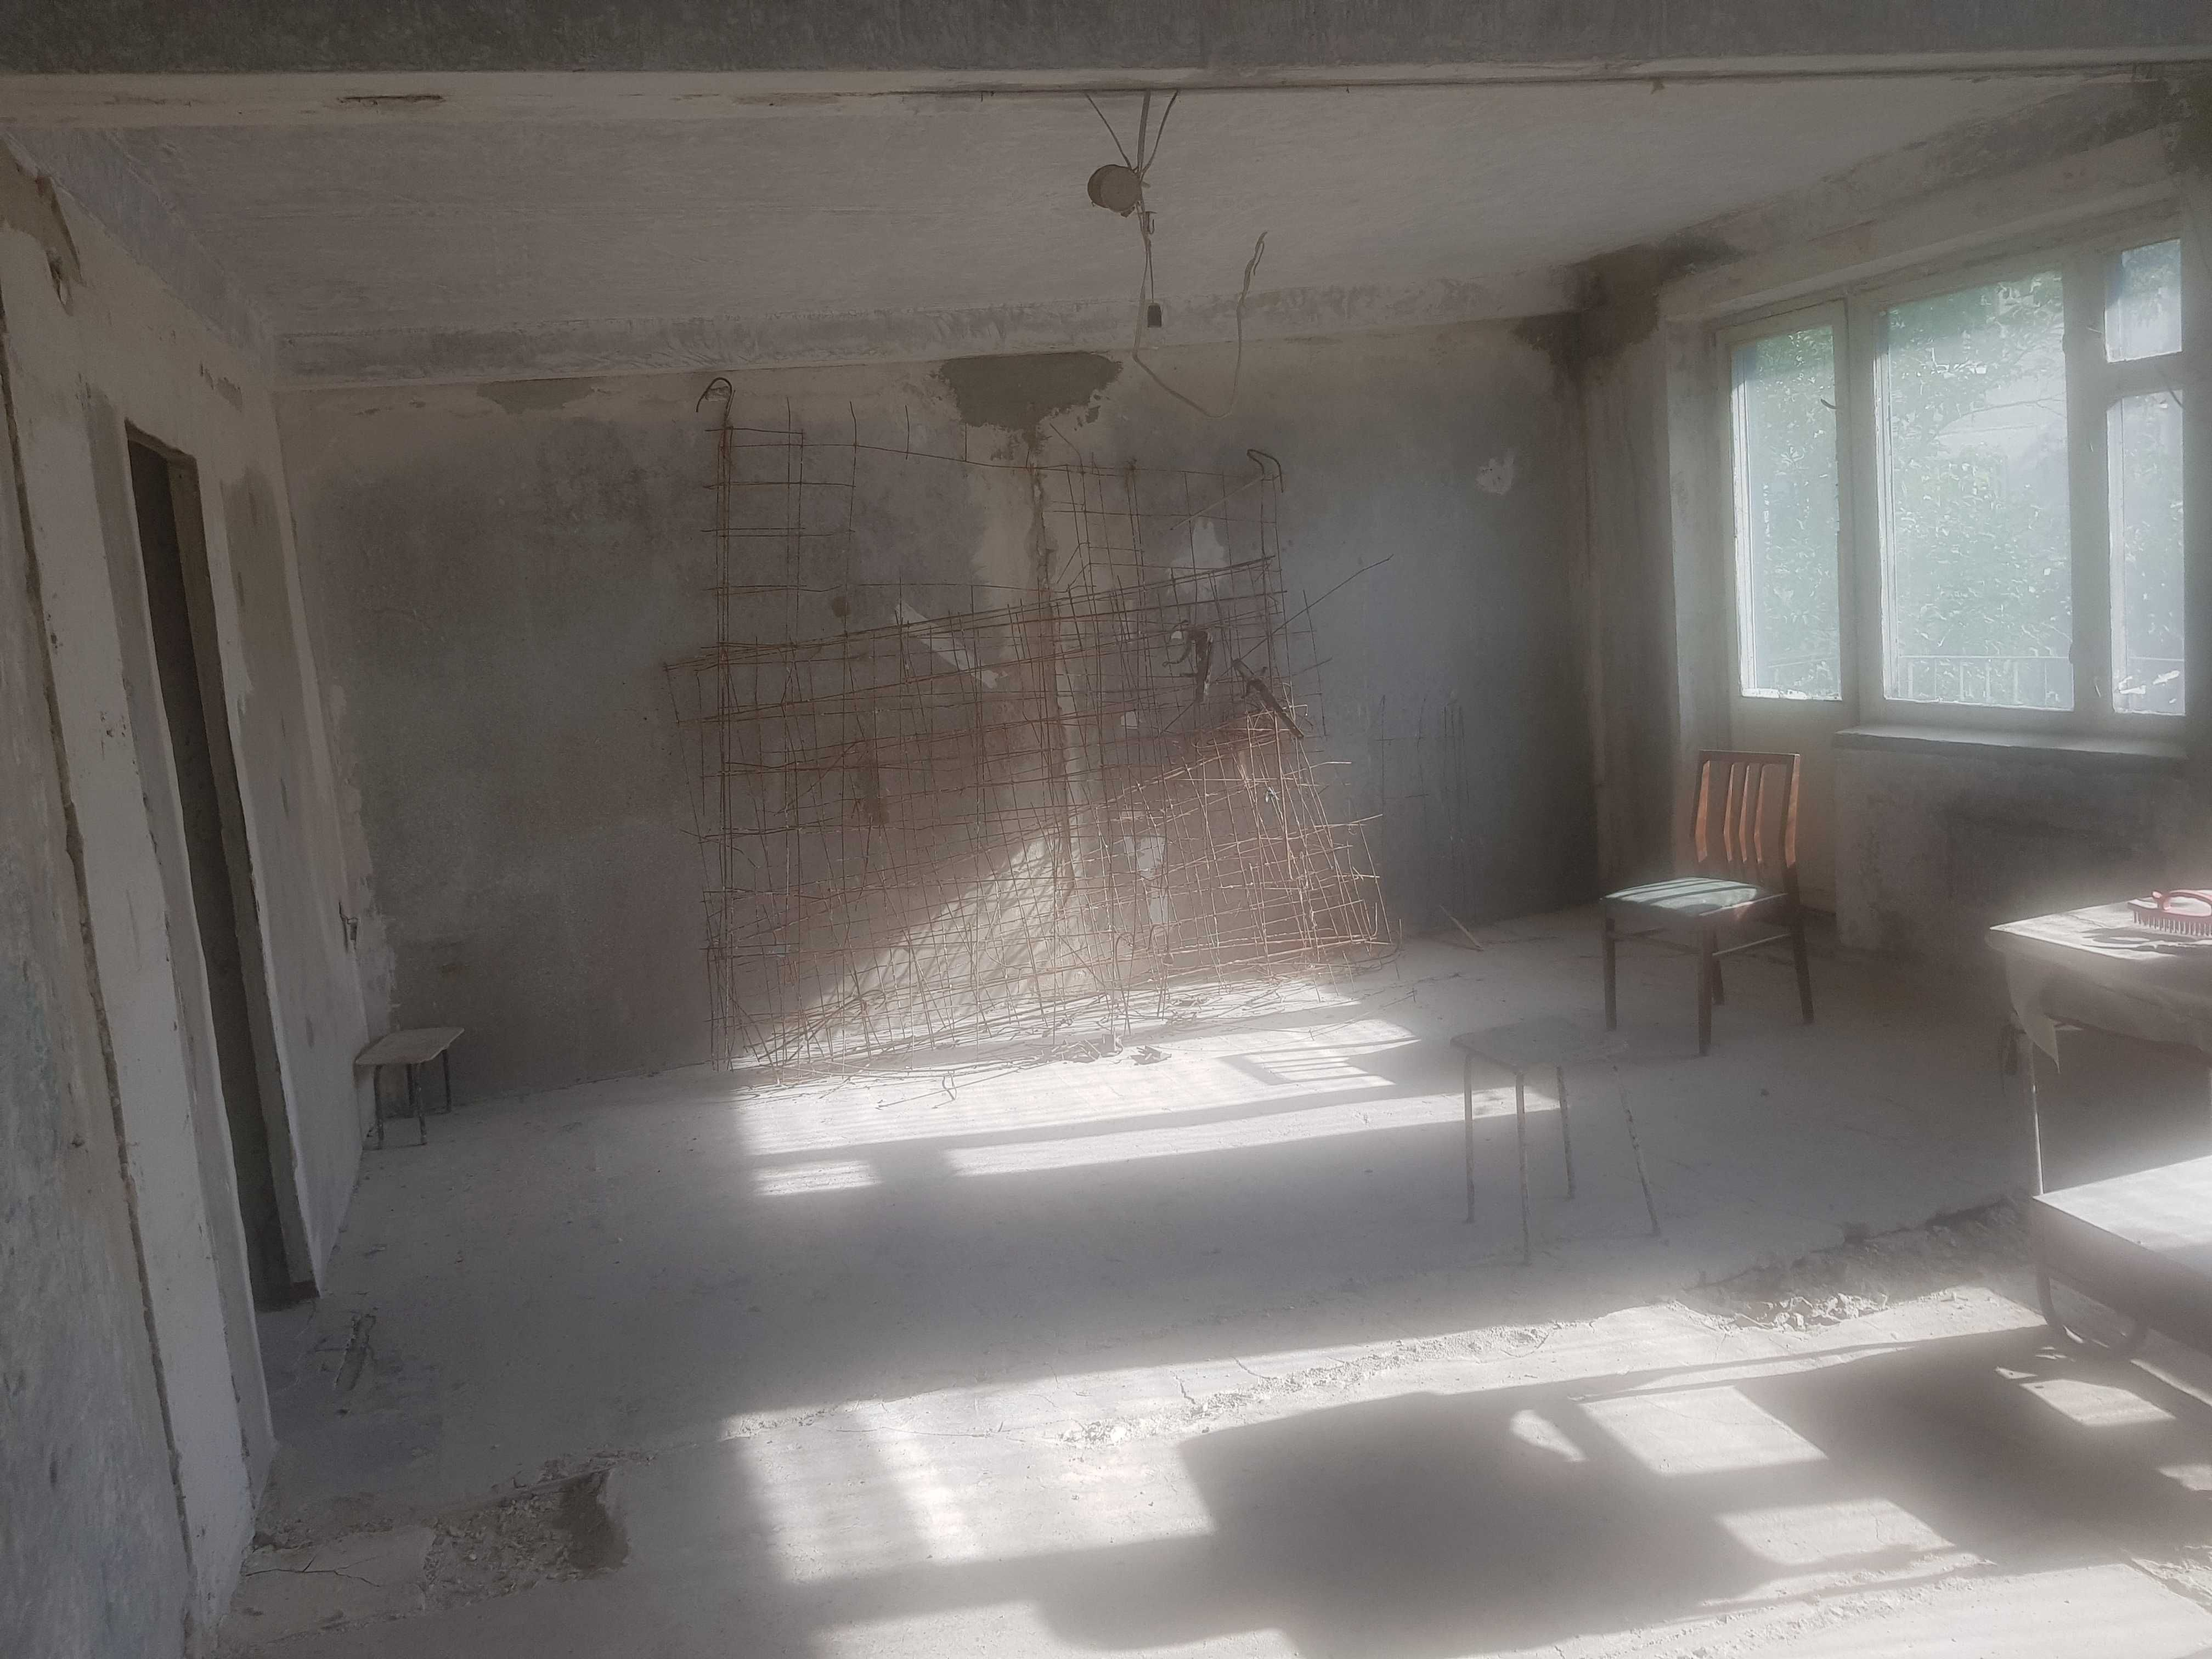 Продам 2х комнатную квартиру под ремонт. м-н Солнечный. Цена 5100 у.е.